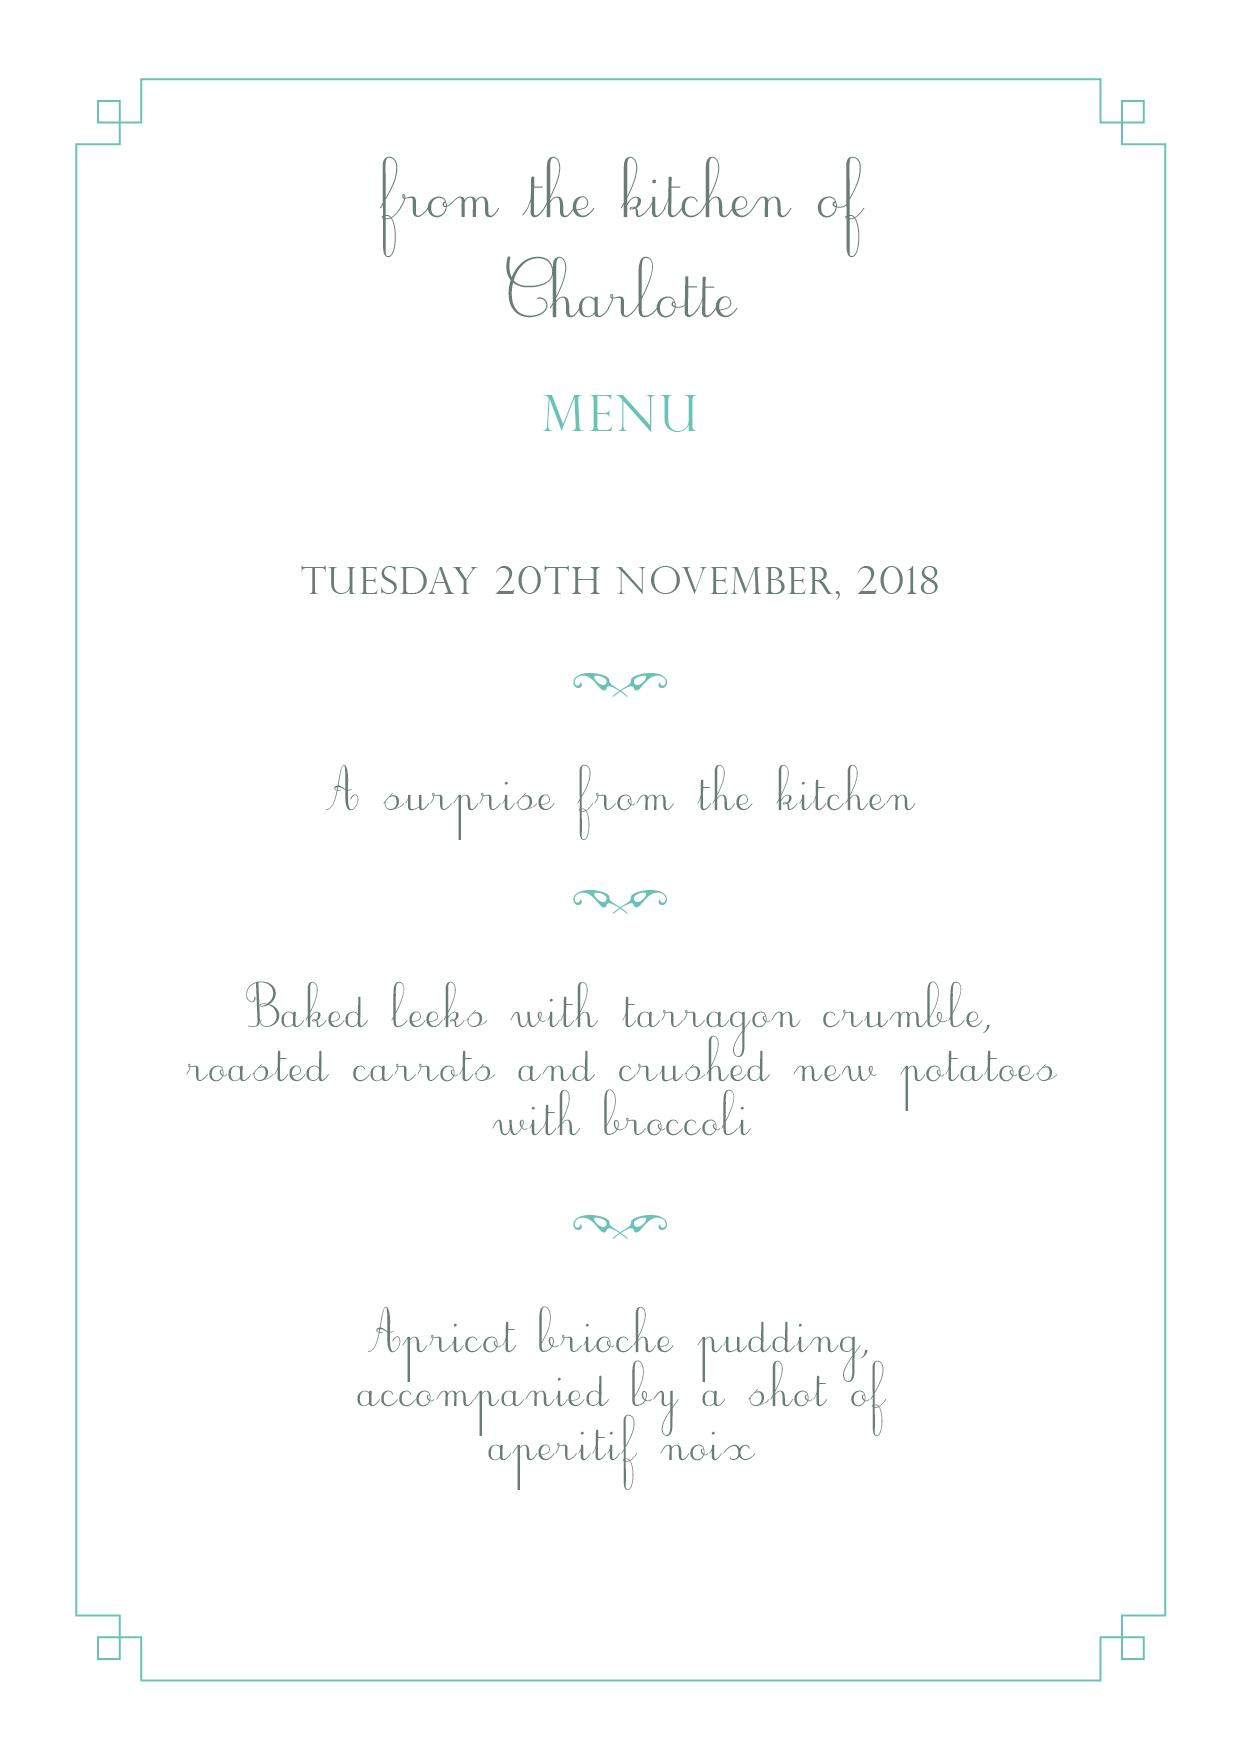 Charlotte's menus 21.11.18.jpg